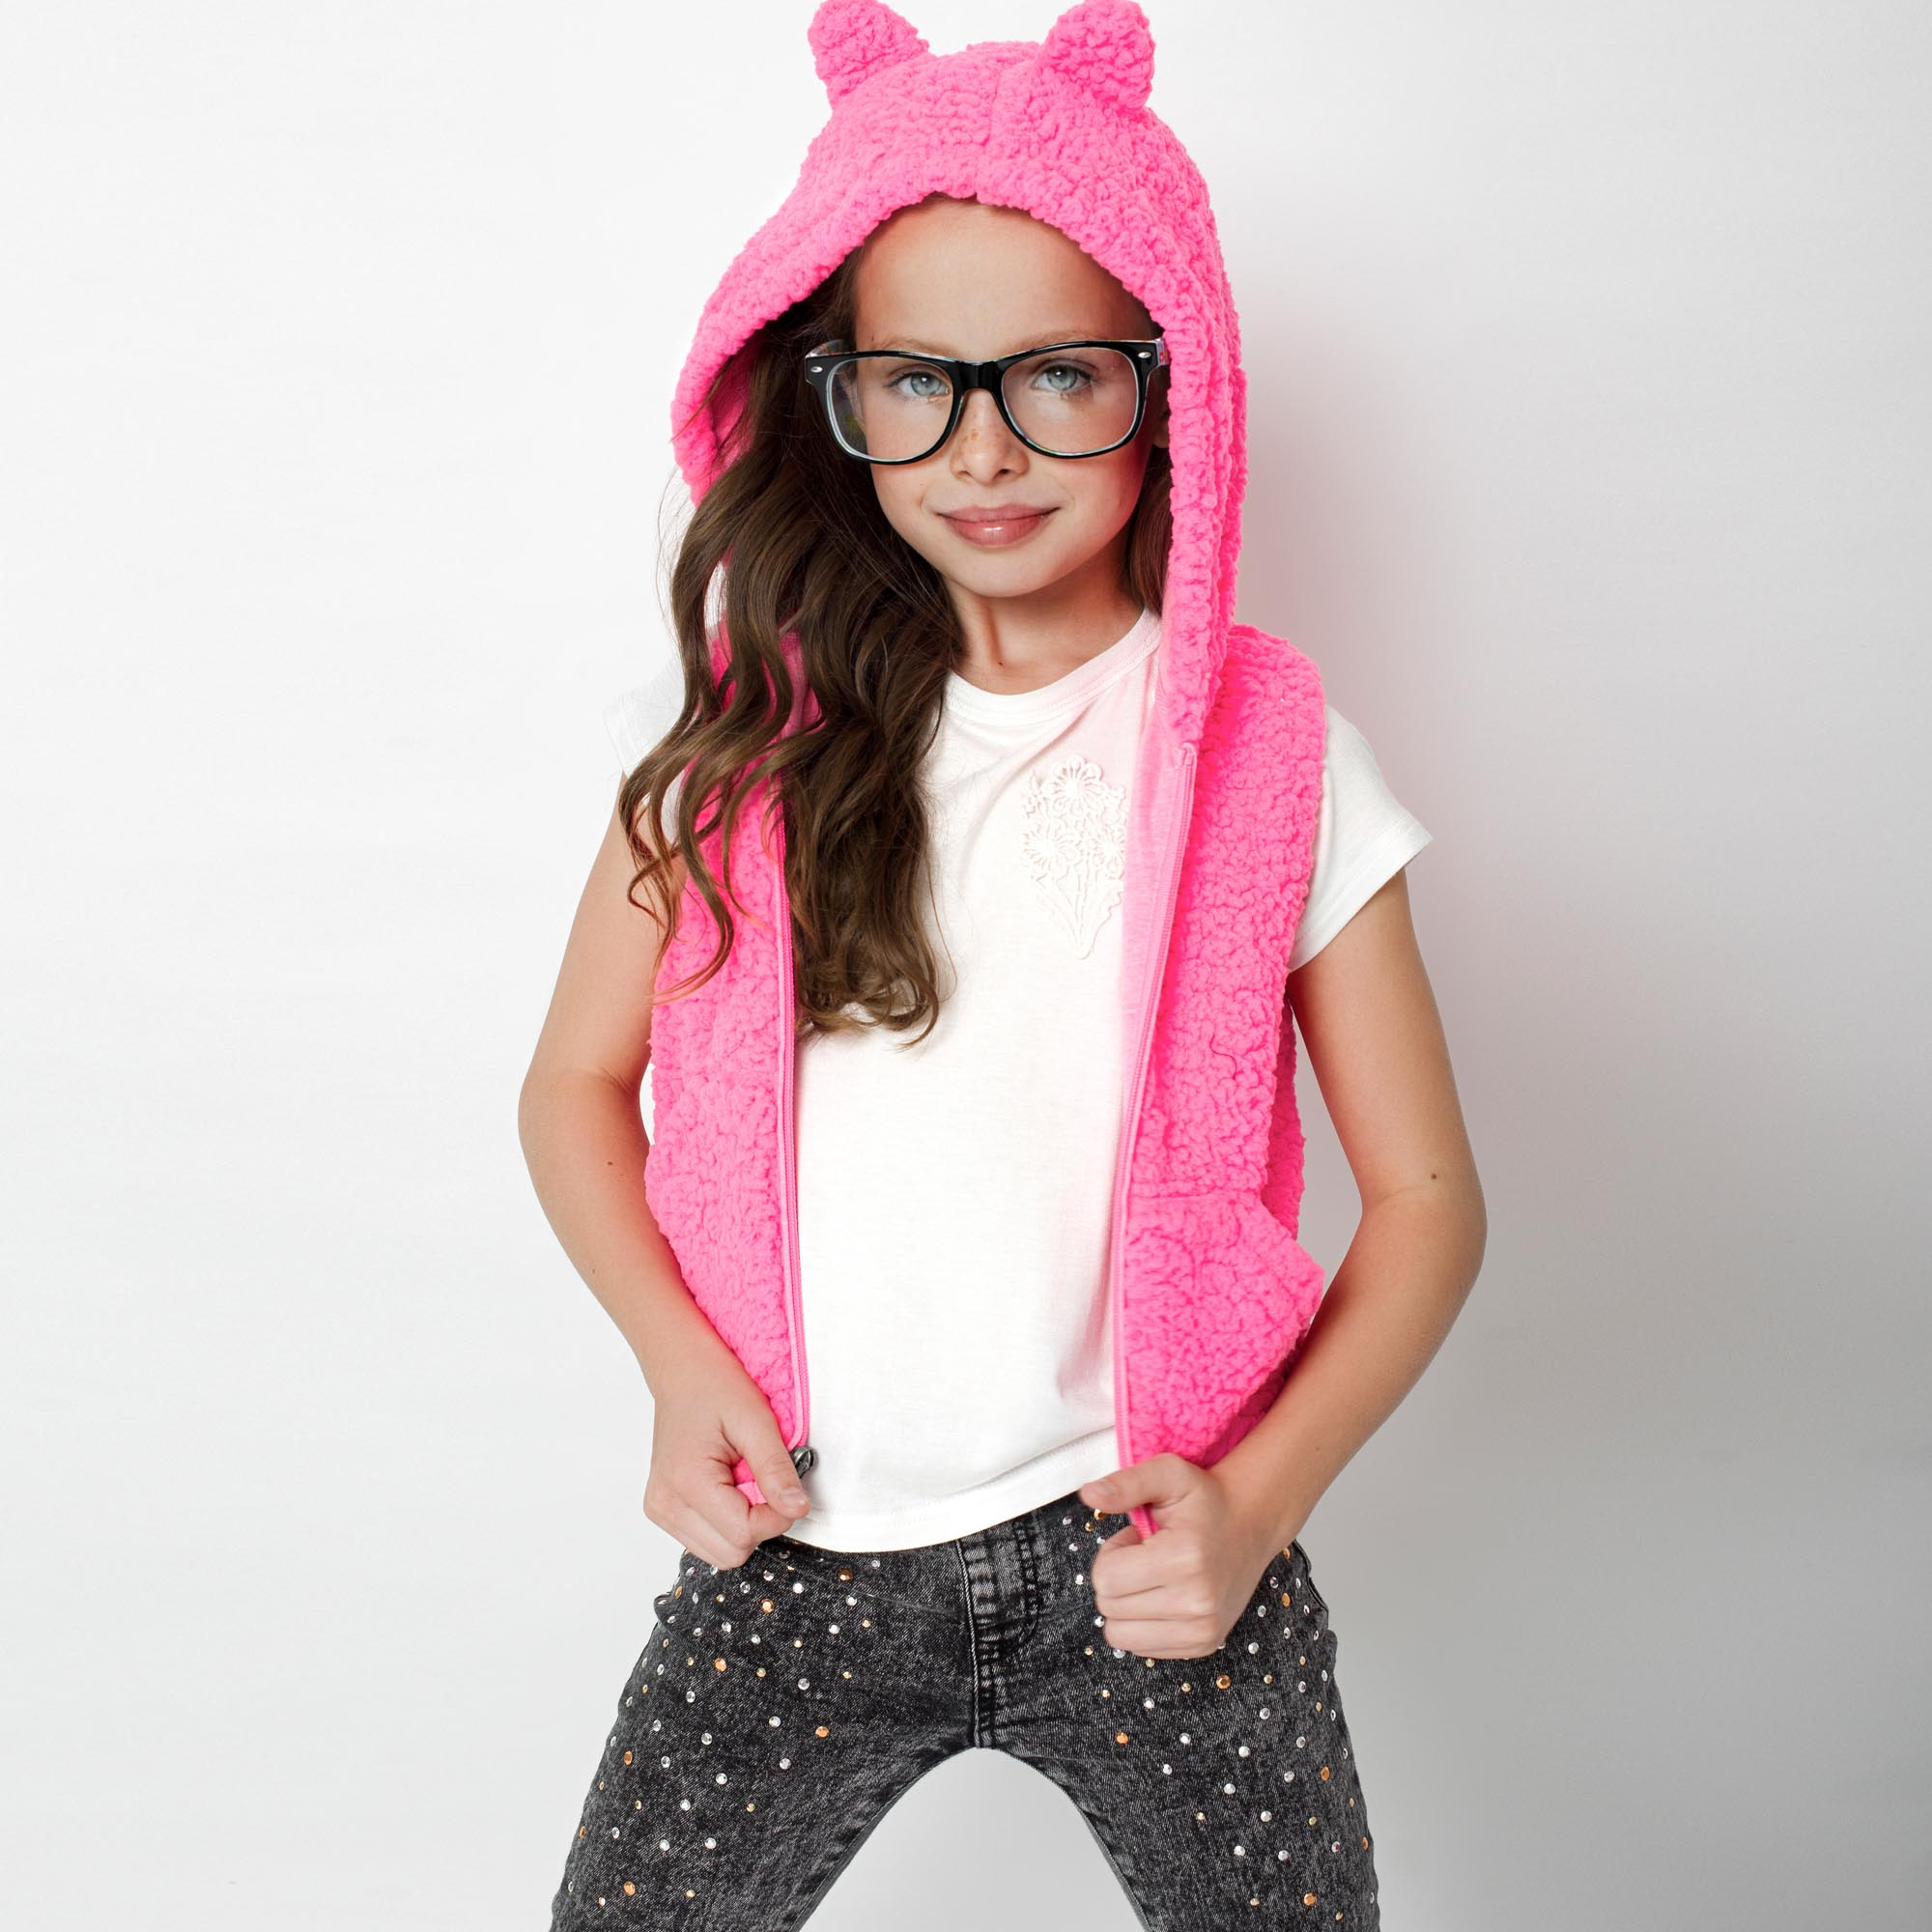 nyc-photographers-kids-modeling-10005.jpg